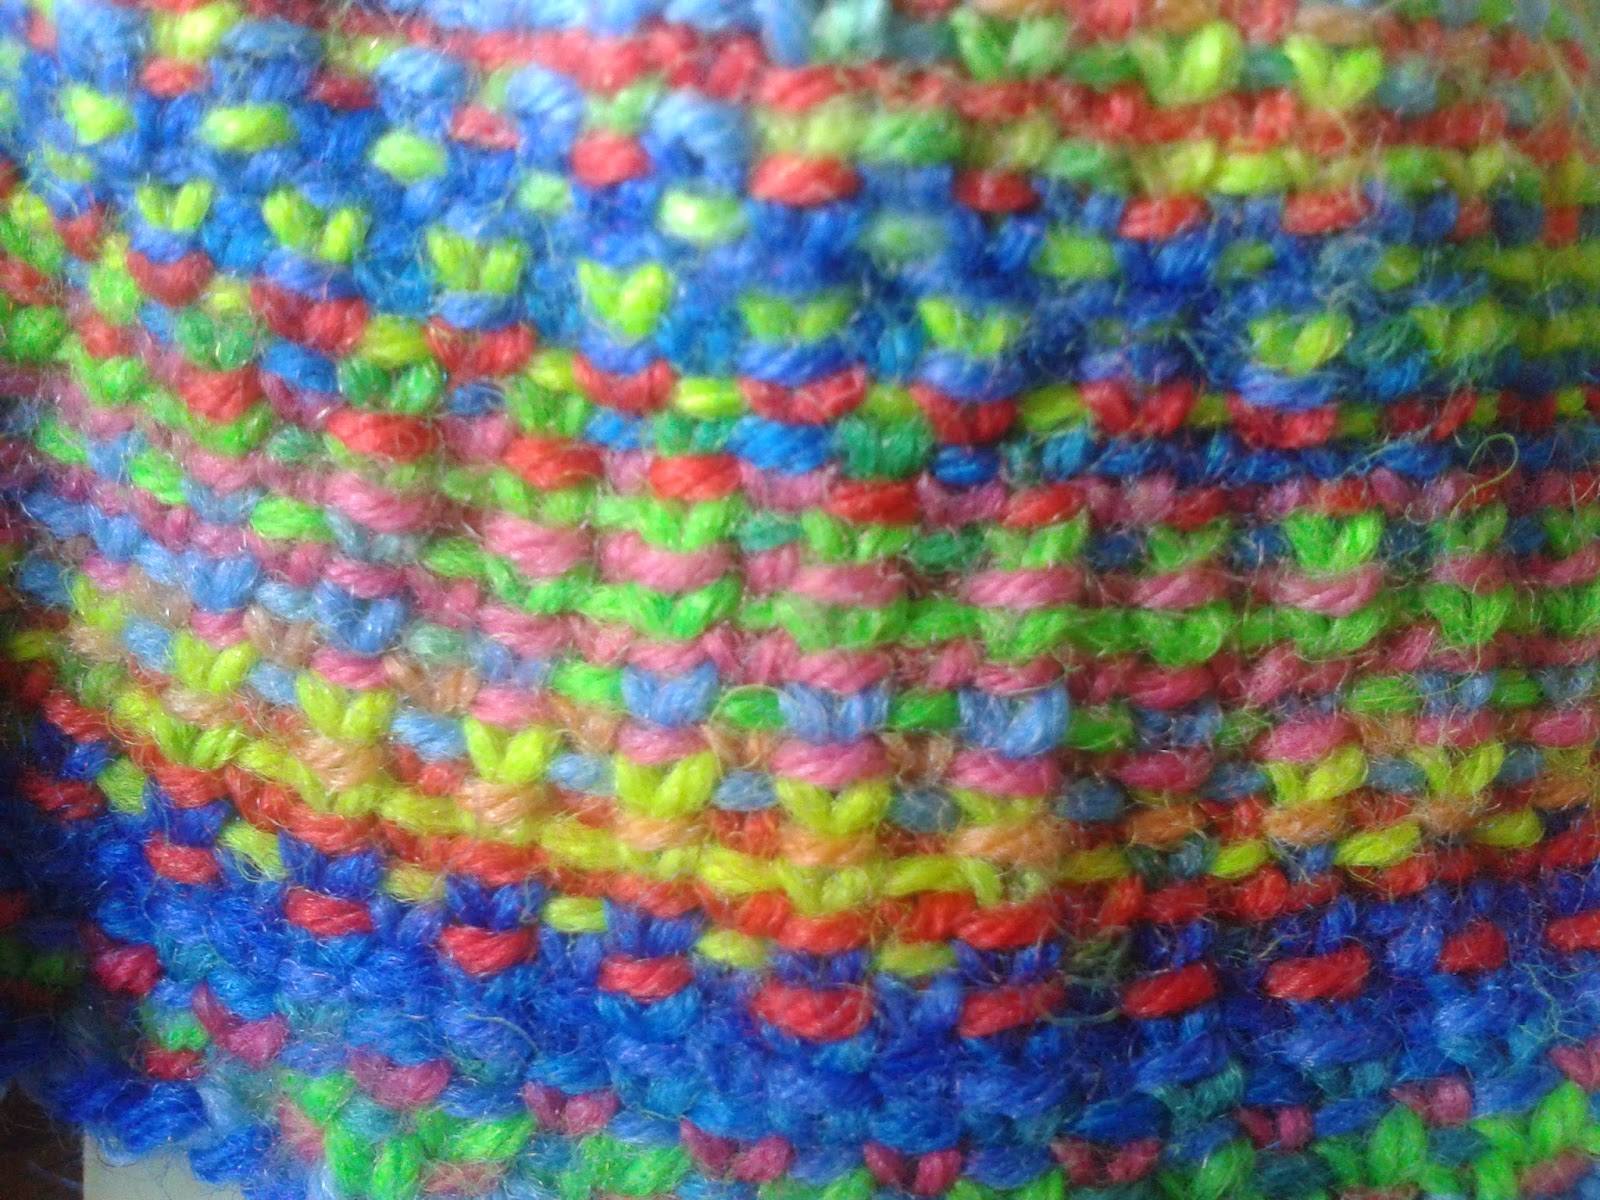 Knitting Linen Stitch On Circular Needles : funkycrochet: Oh for the love of knitting! A little progress on the Linen Sti...